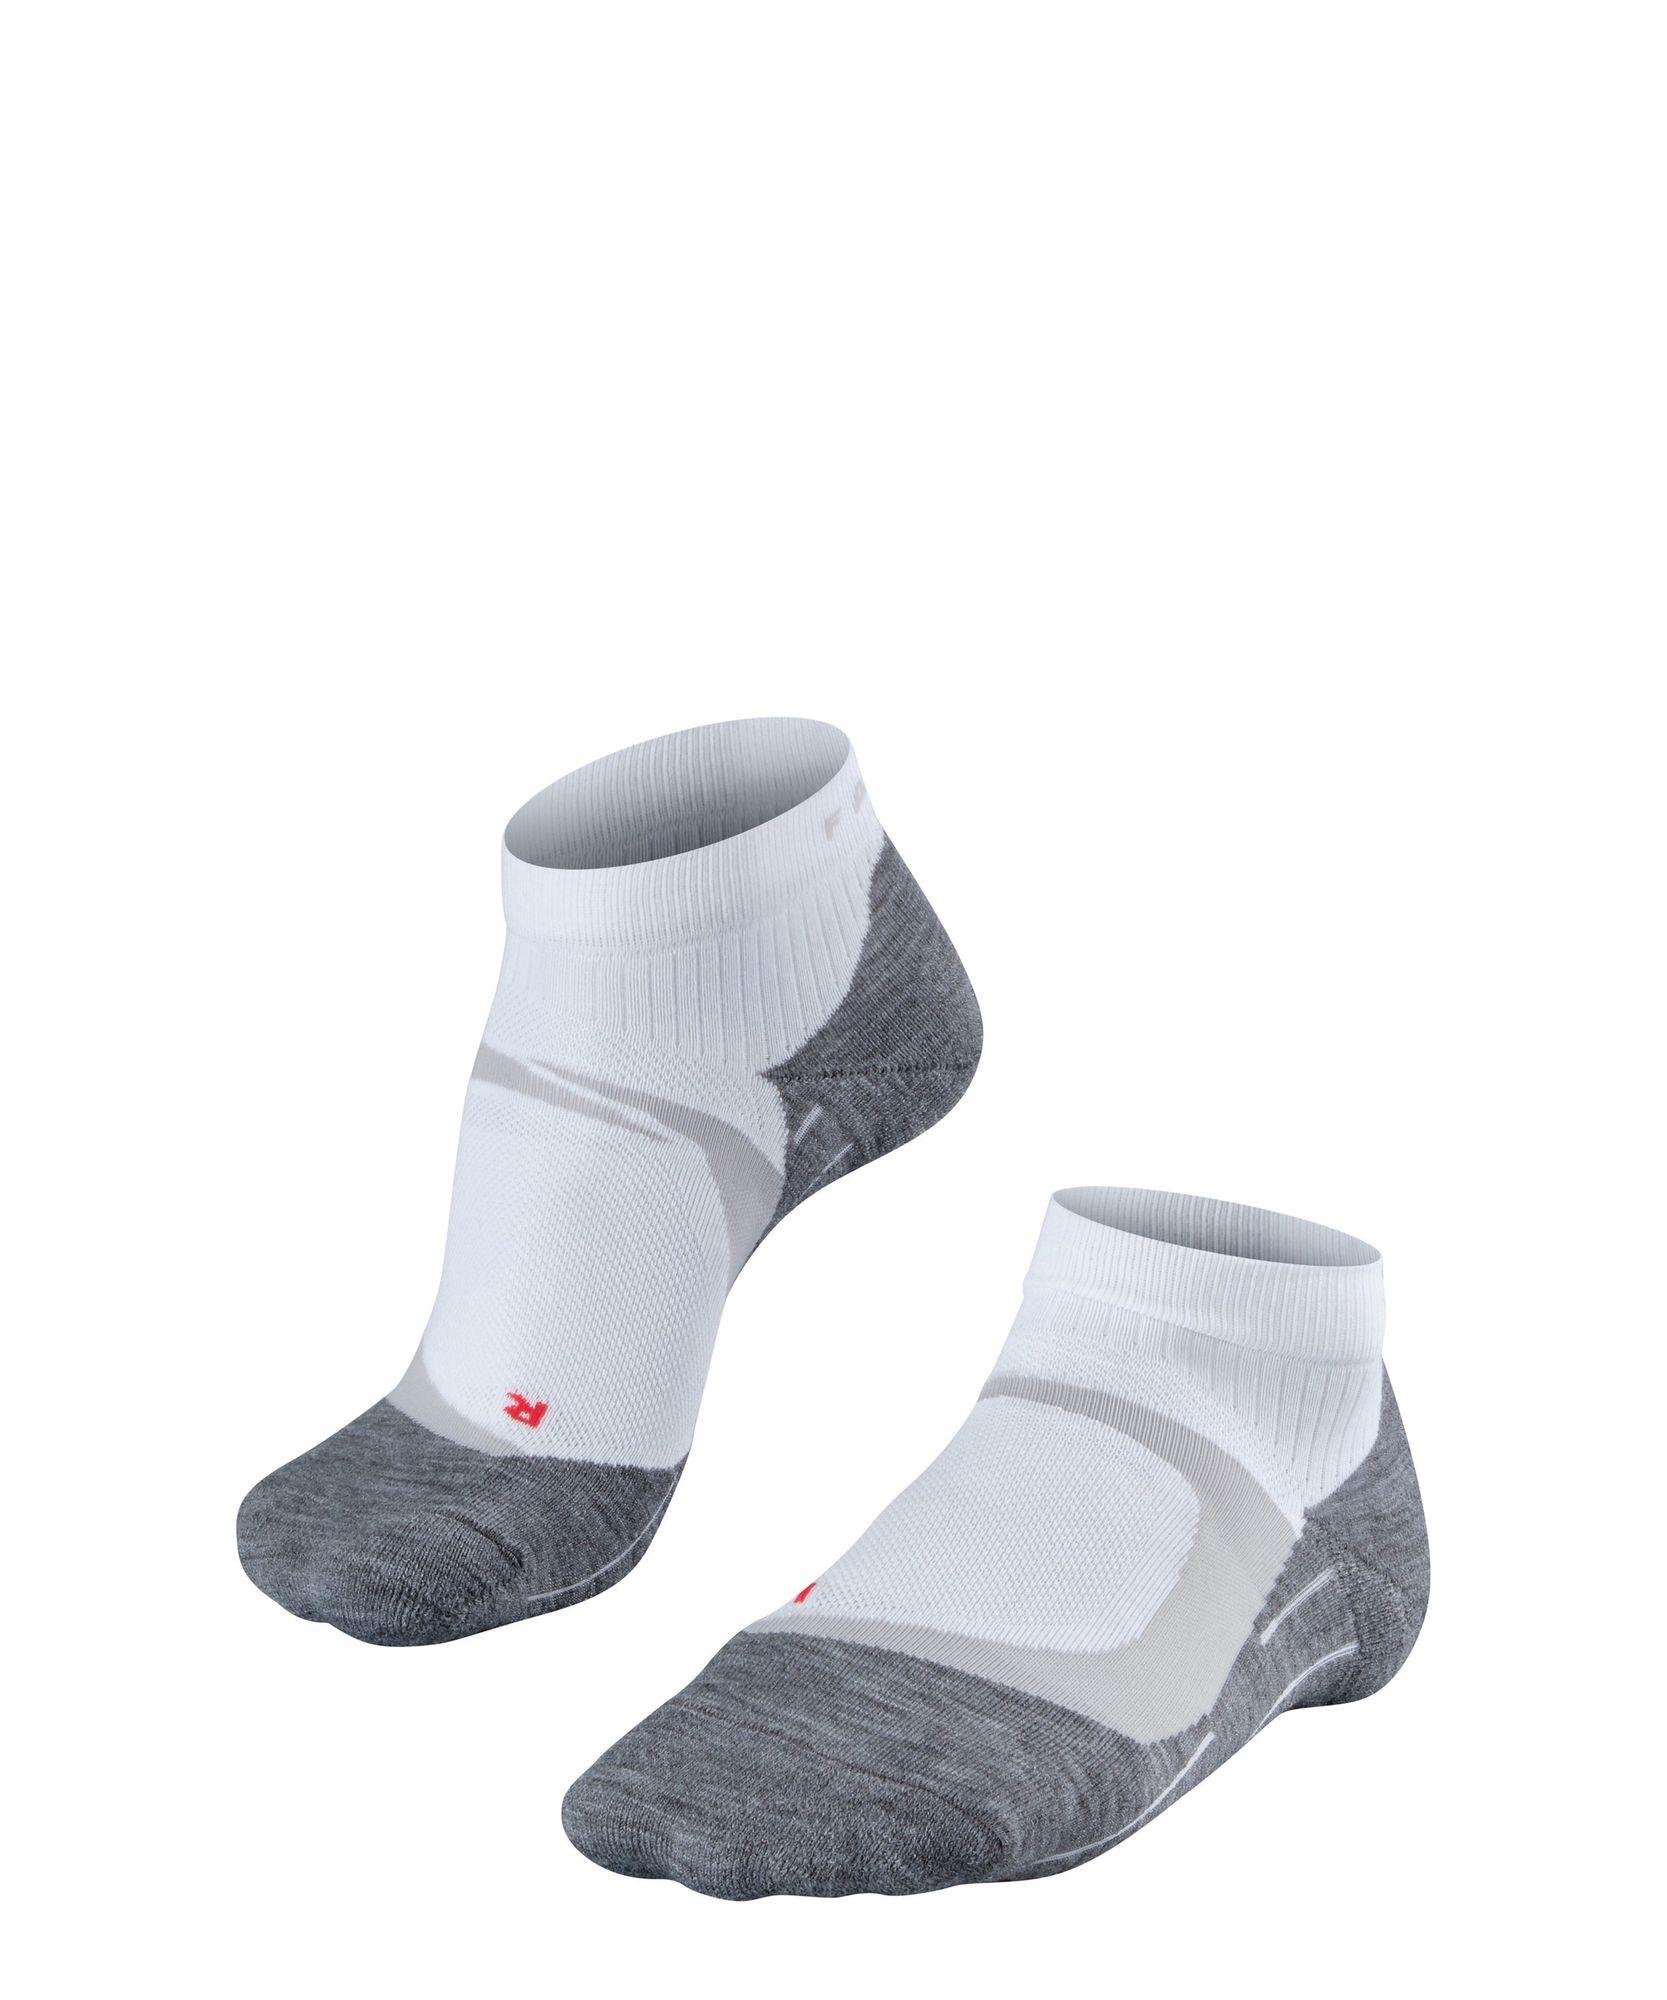 Falke RU4 Cool Short Damen (Weiß)